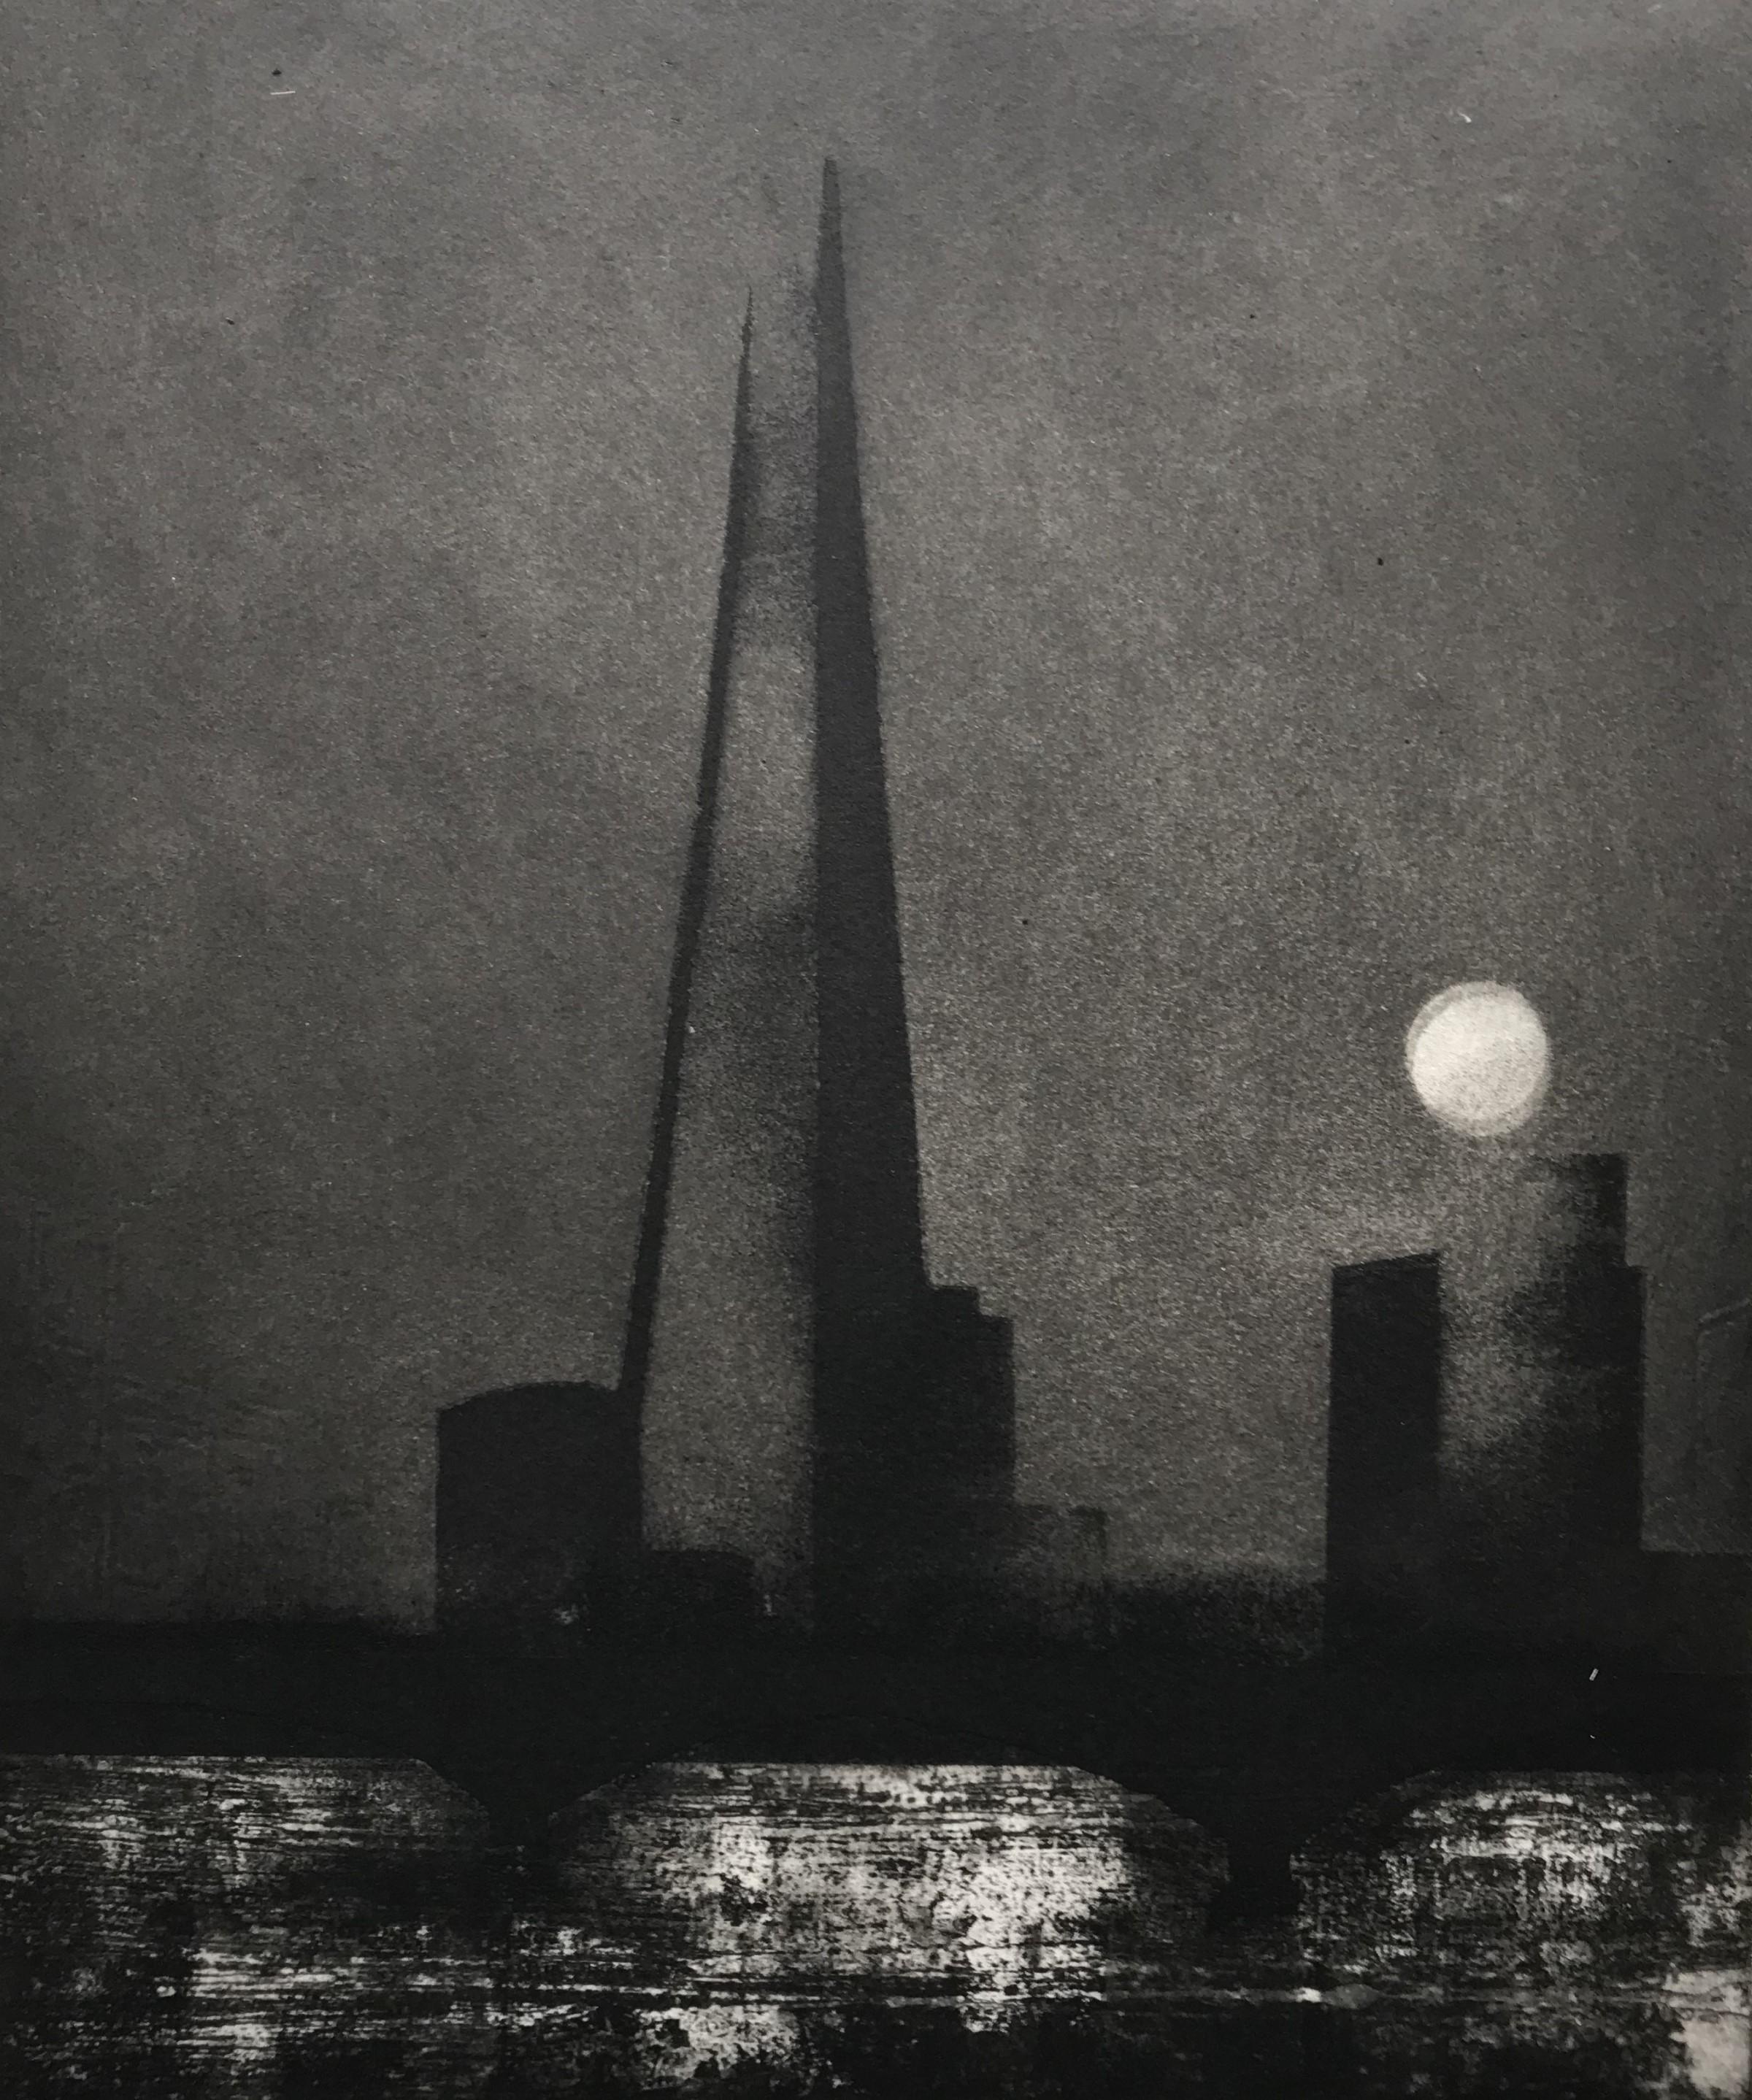 The Thames. Sturgeon Moon.